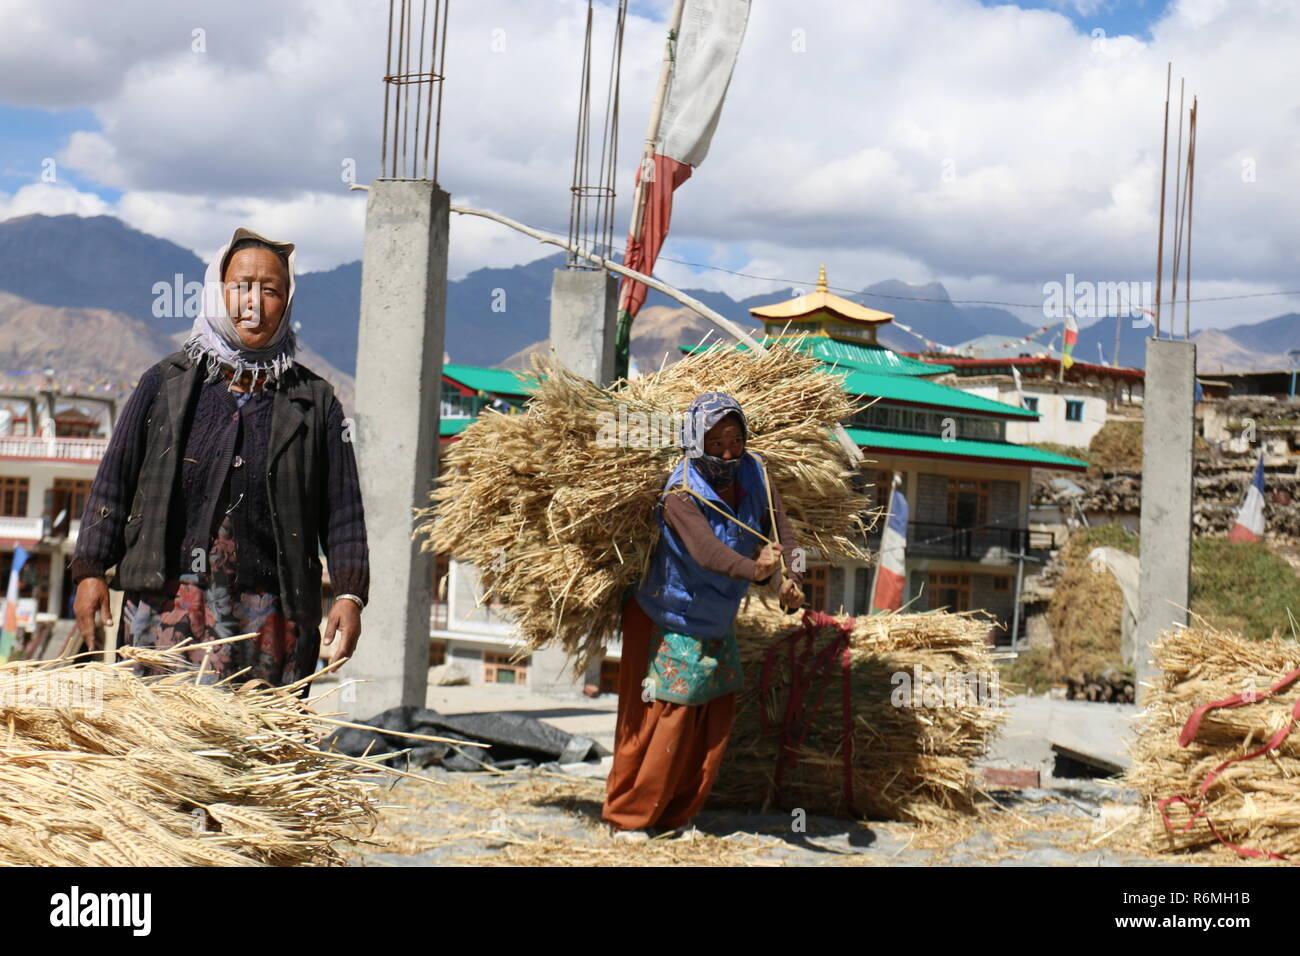 Nako, Kinnaur, Himachal Pradesh, India - Stock Image